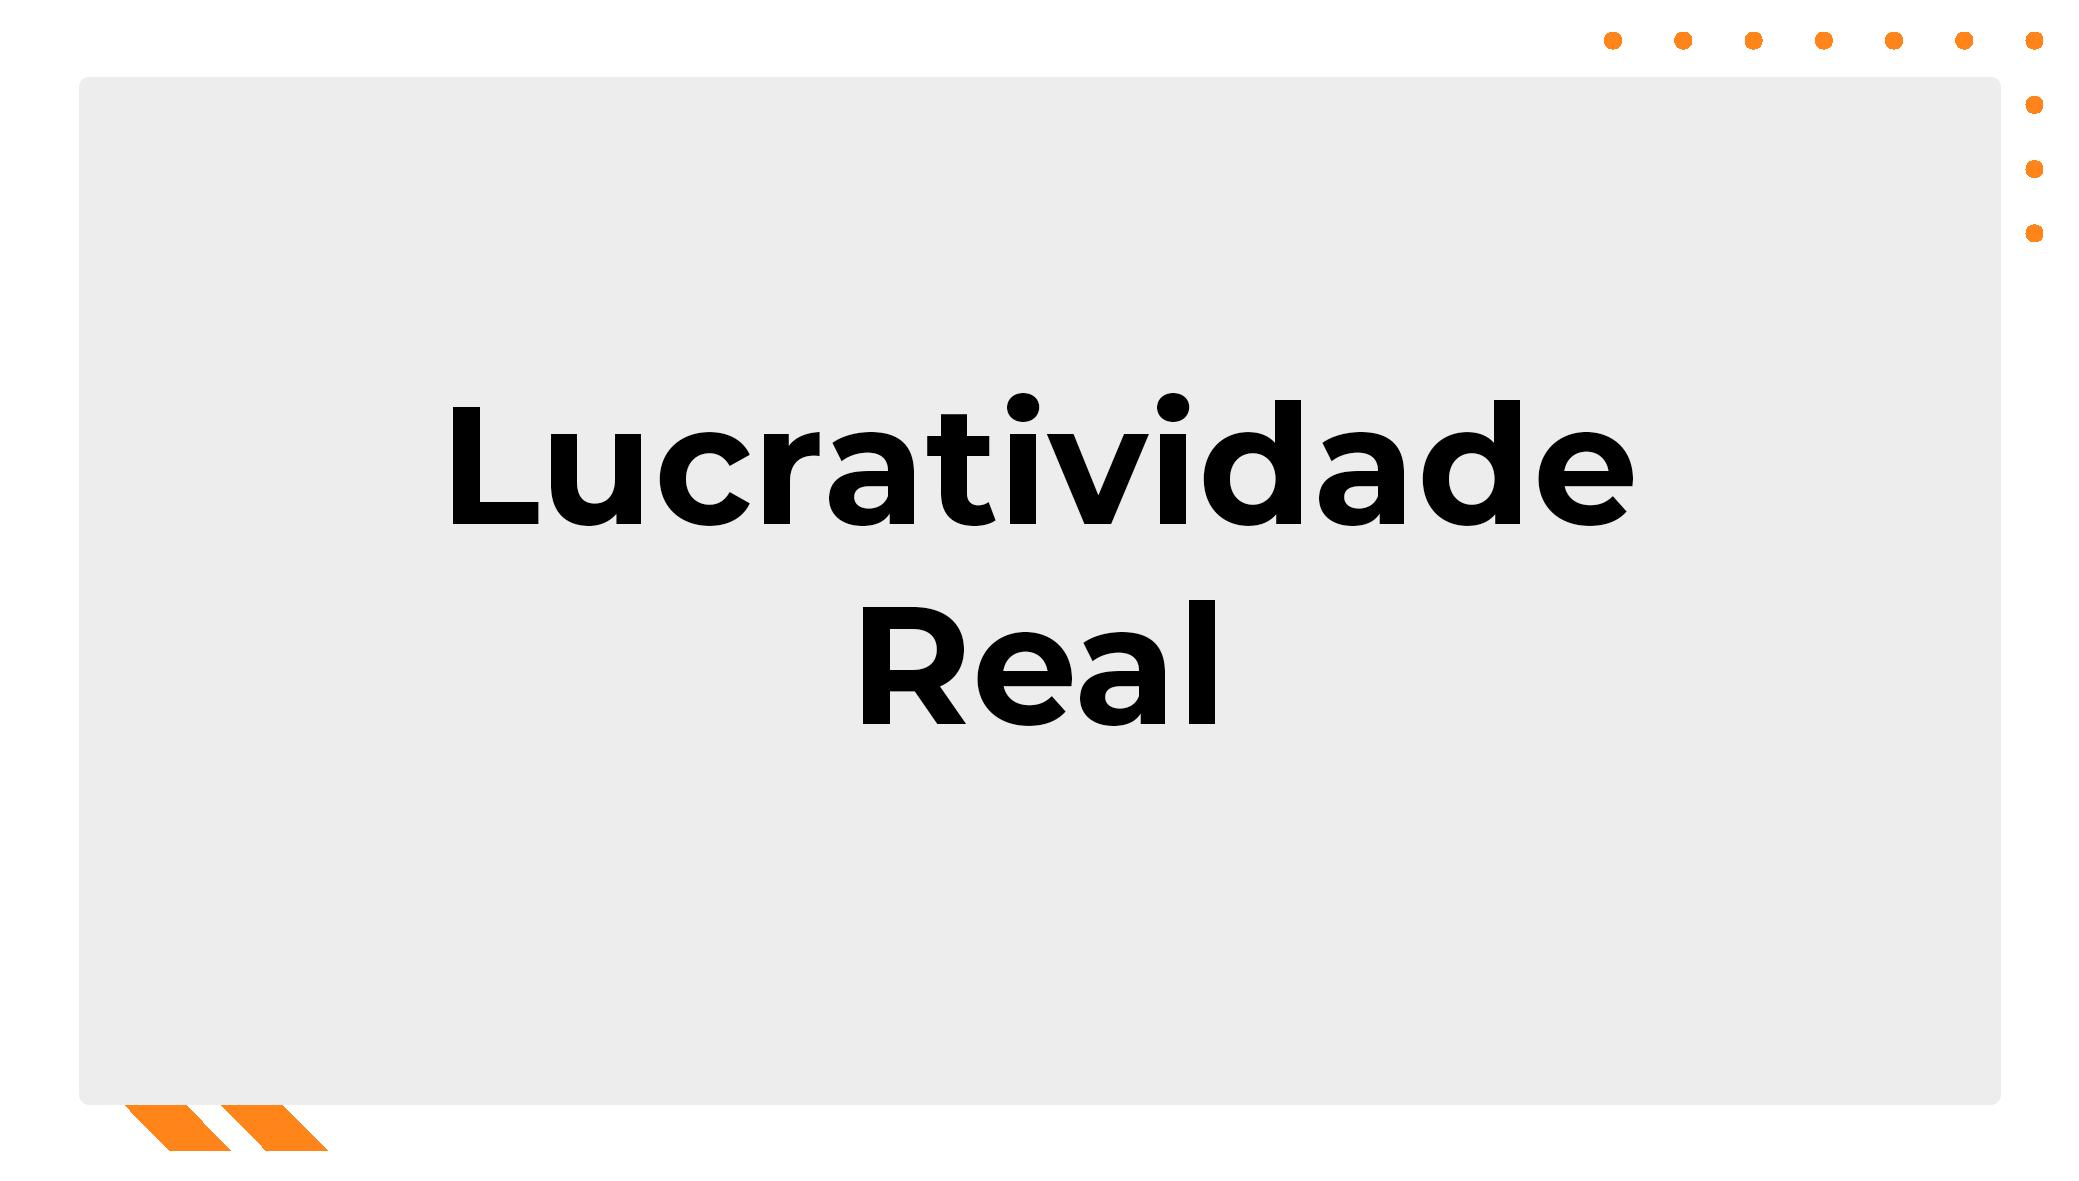 Lucratividade Real